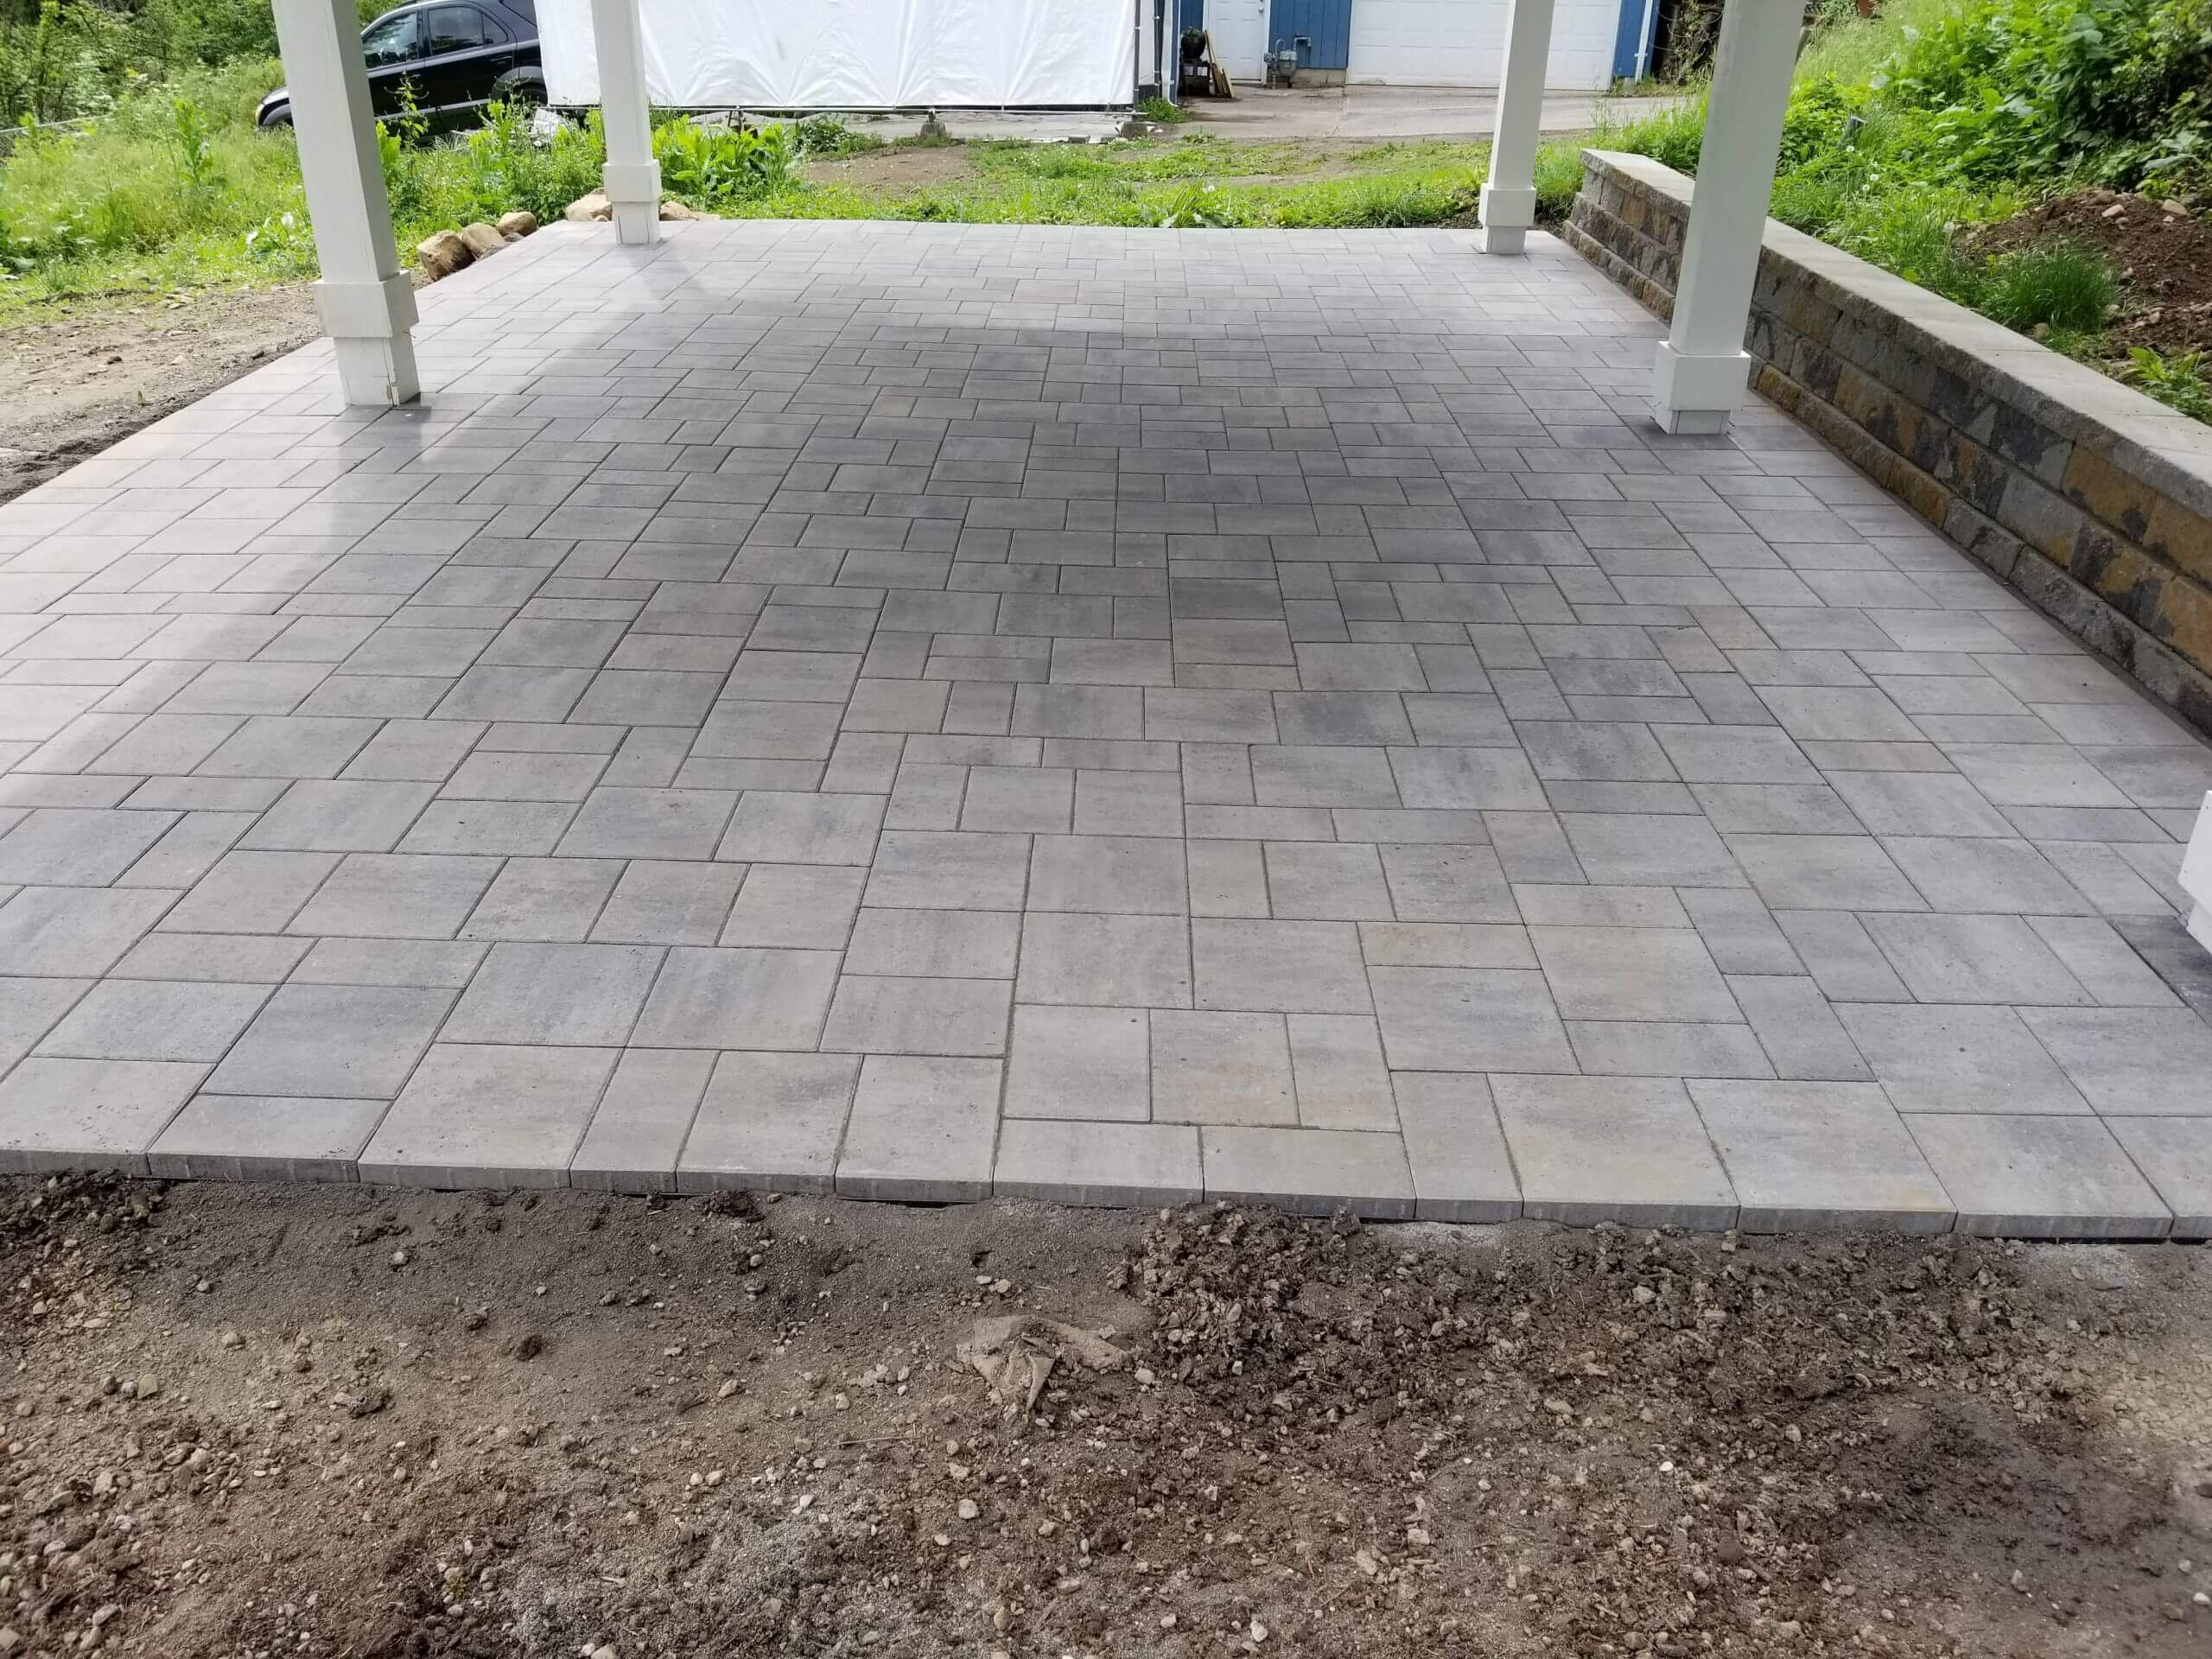 https://shovelandthumb.sfo3.digitaloceanspaces.com/patios walkways/patio 1